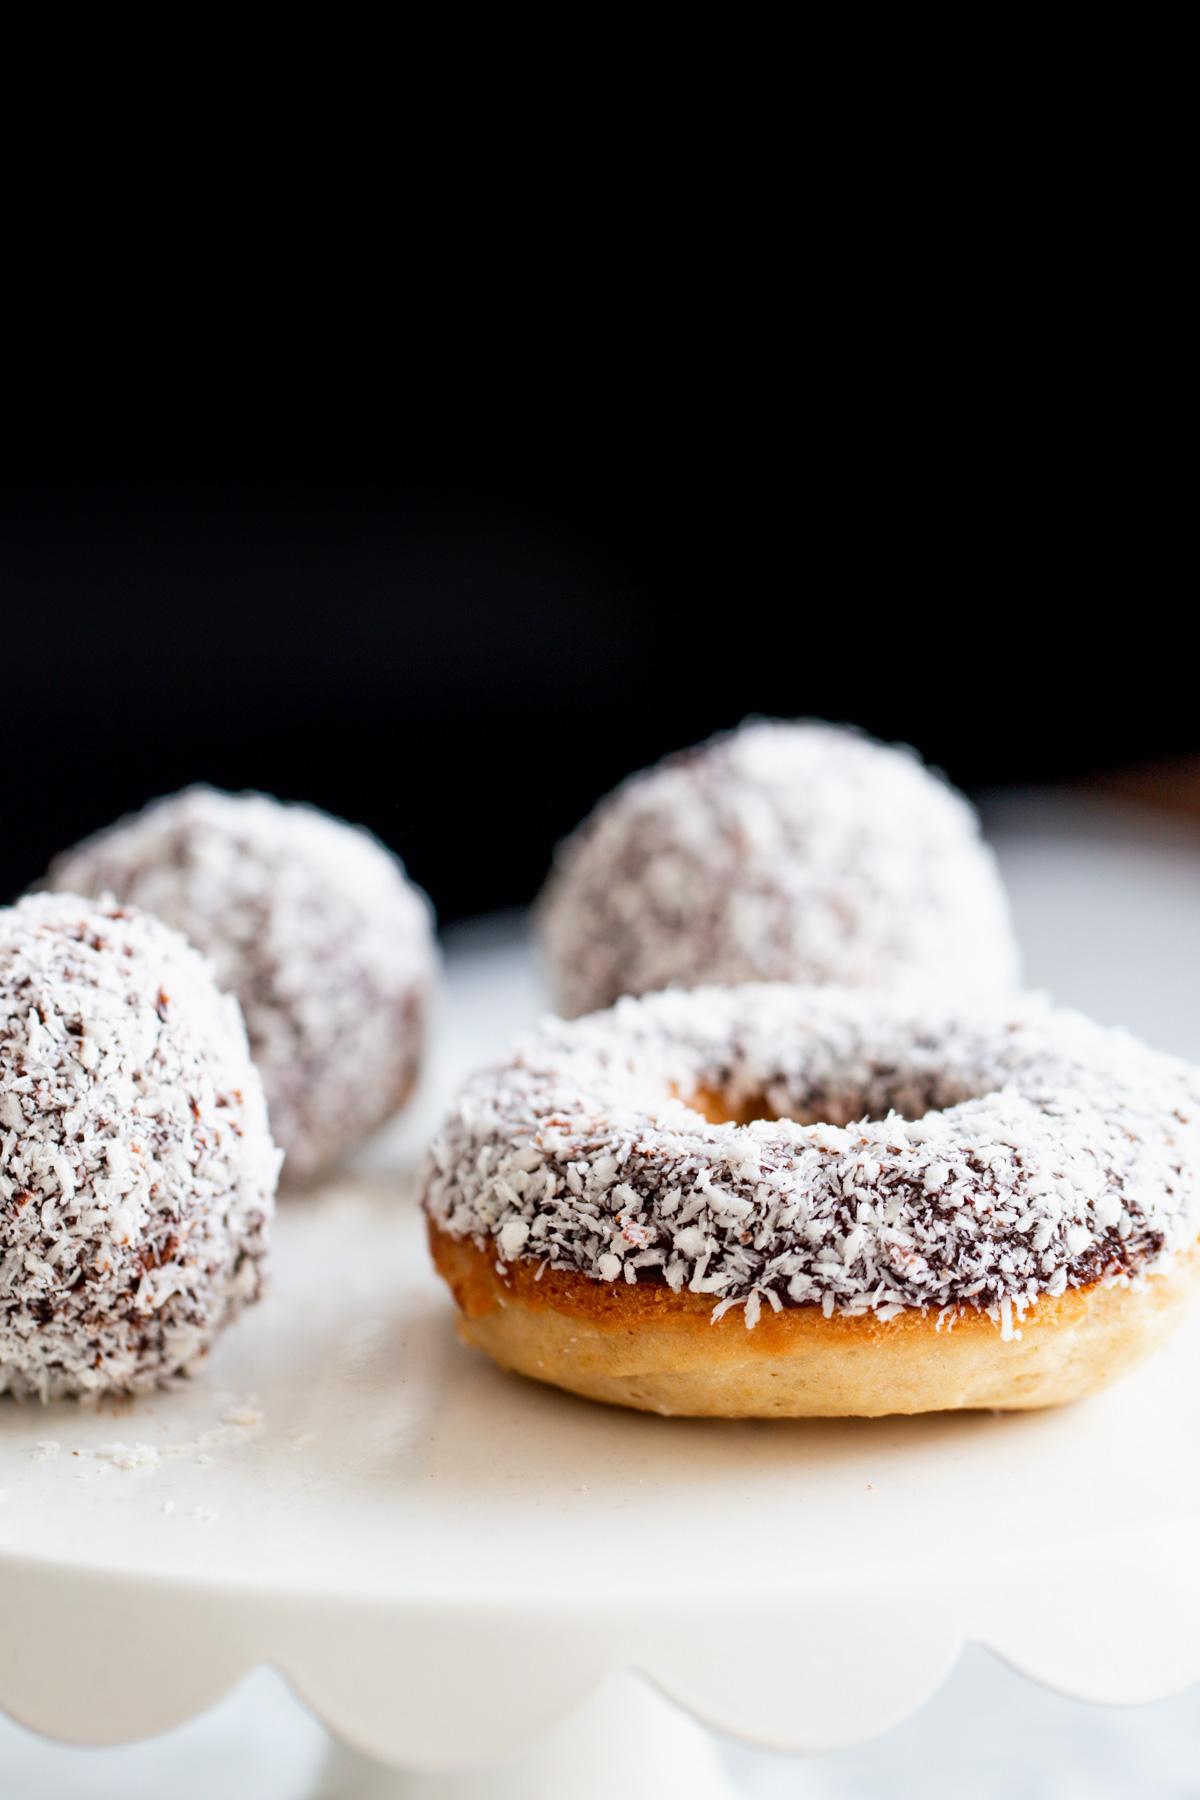 Vegan Baked Lamington Donuts & Donut Holes